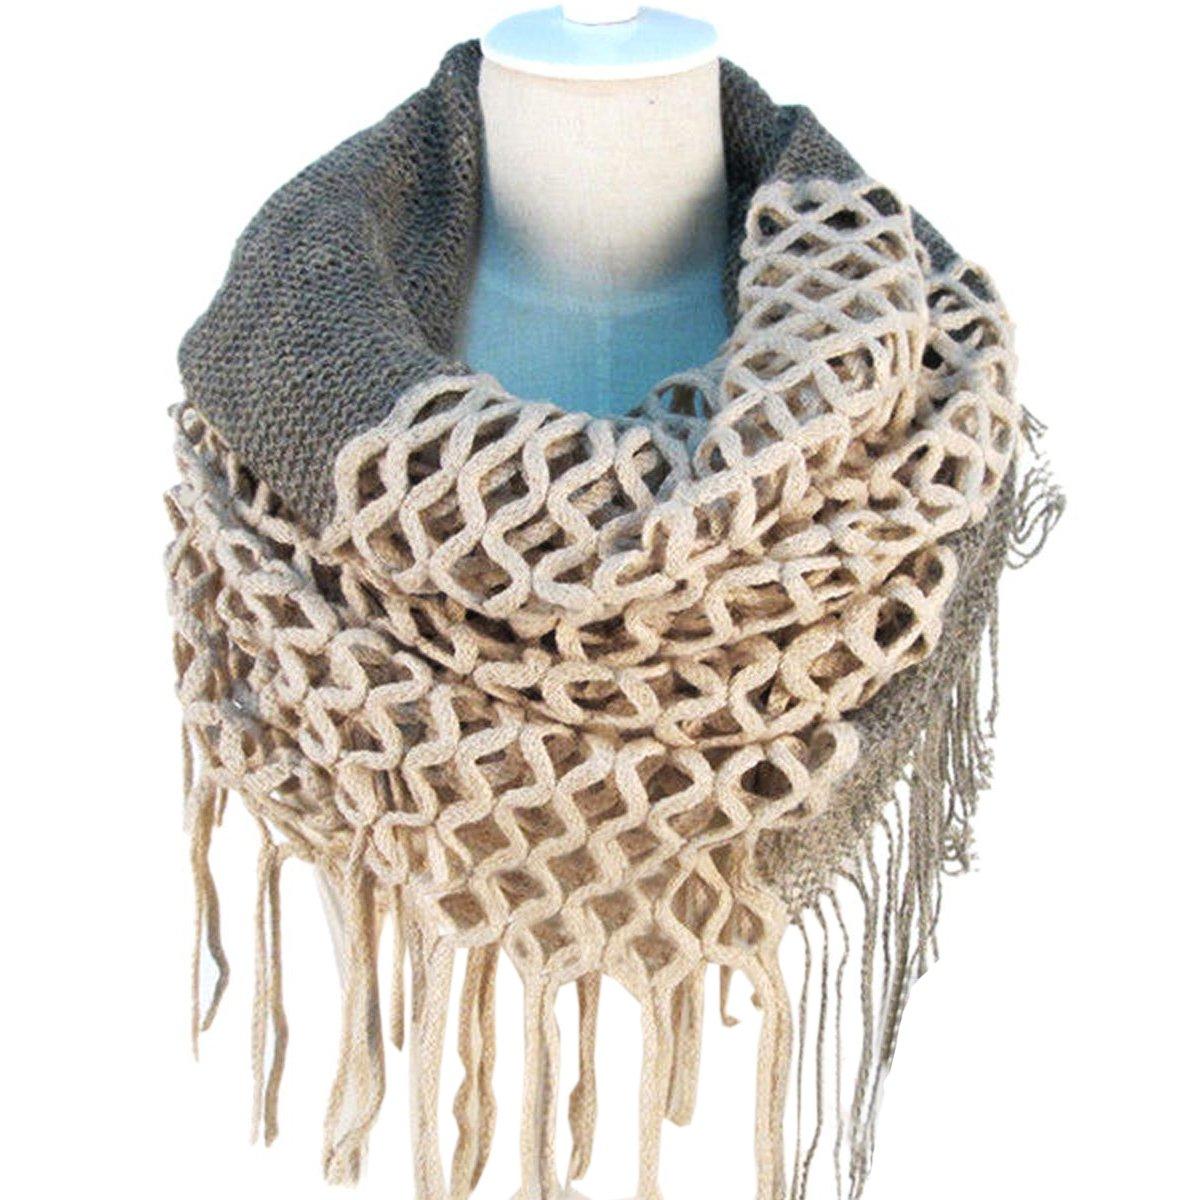 NOVAWO Fashion Women Winter Warm Knit Long Scarf Tassels Shawl Infinity & Straight